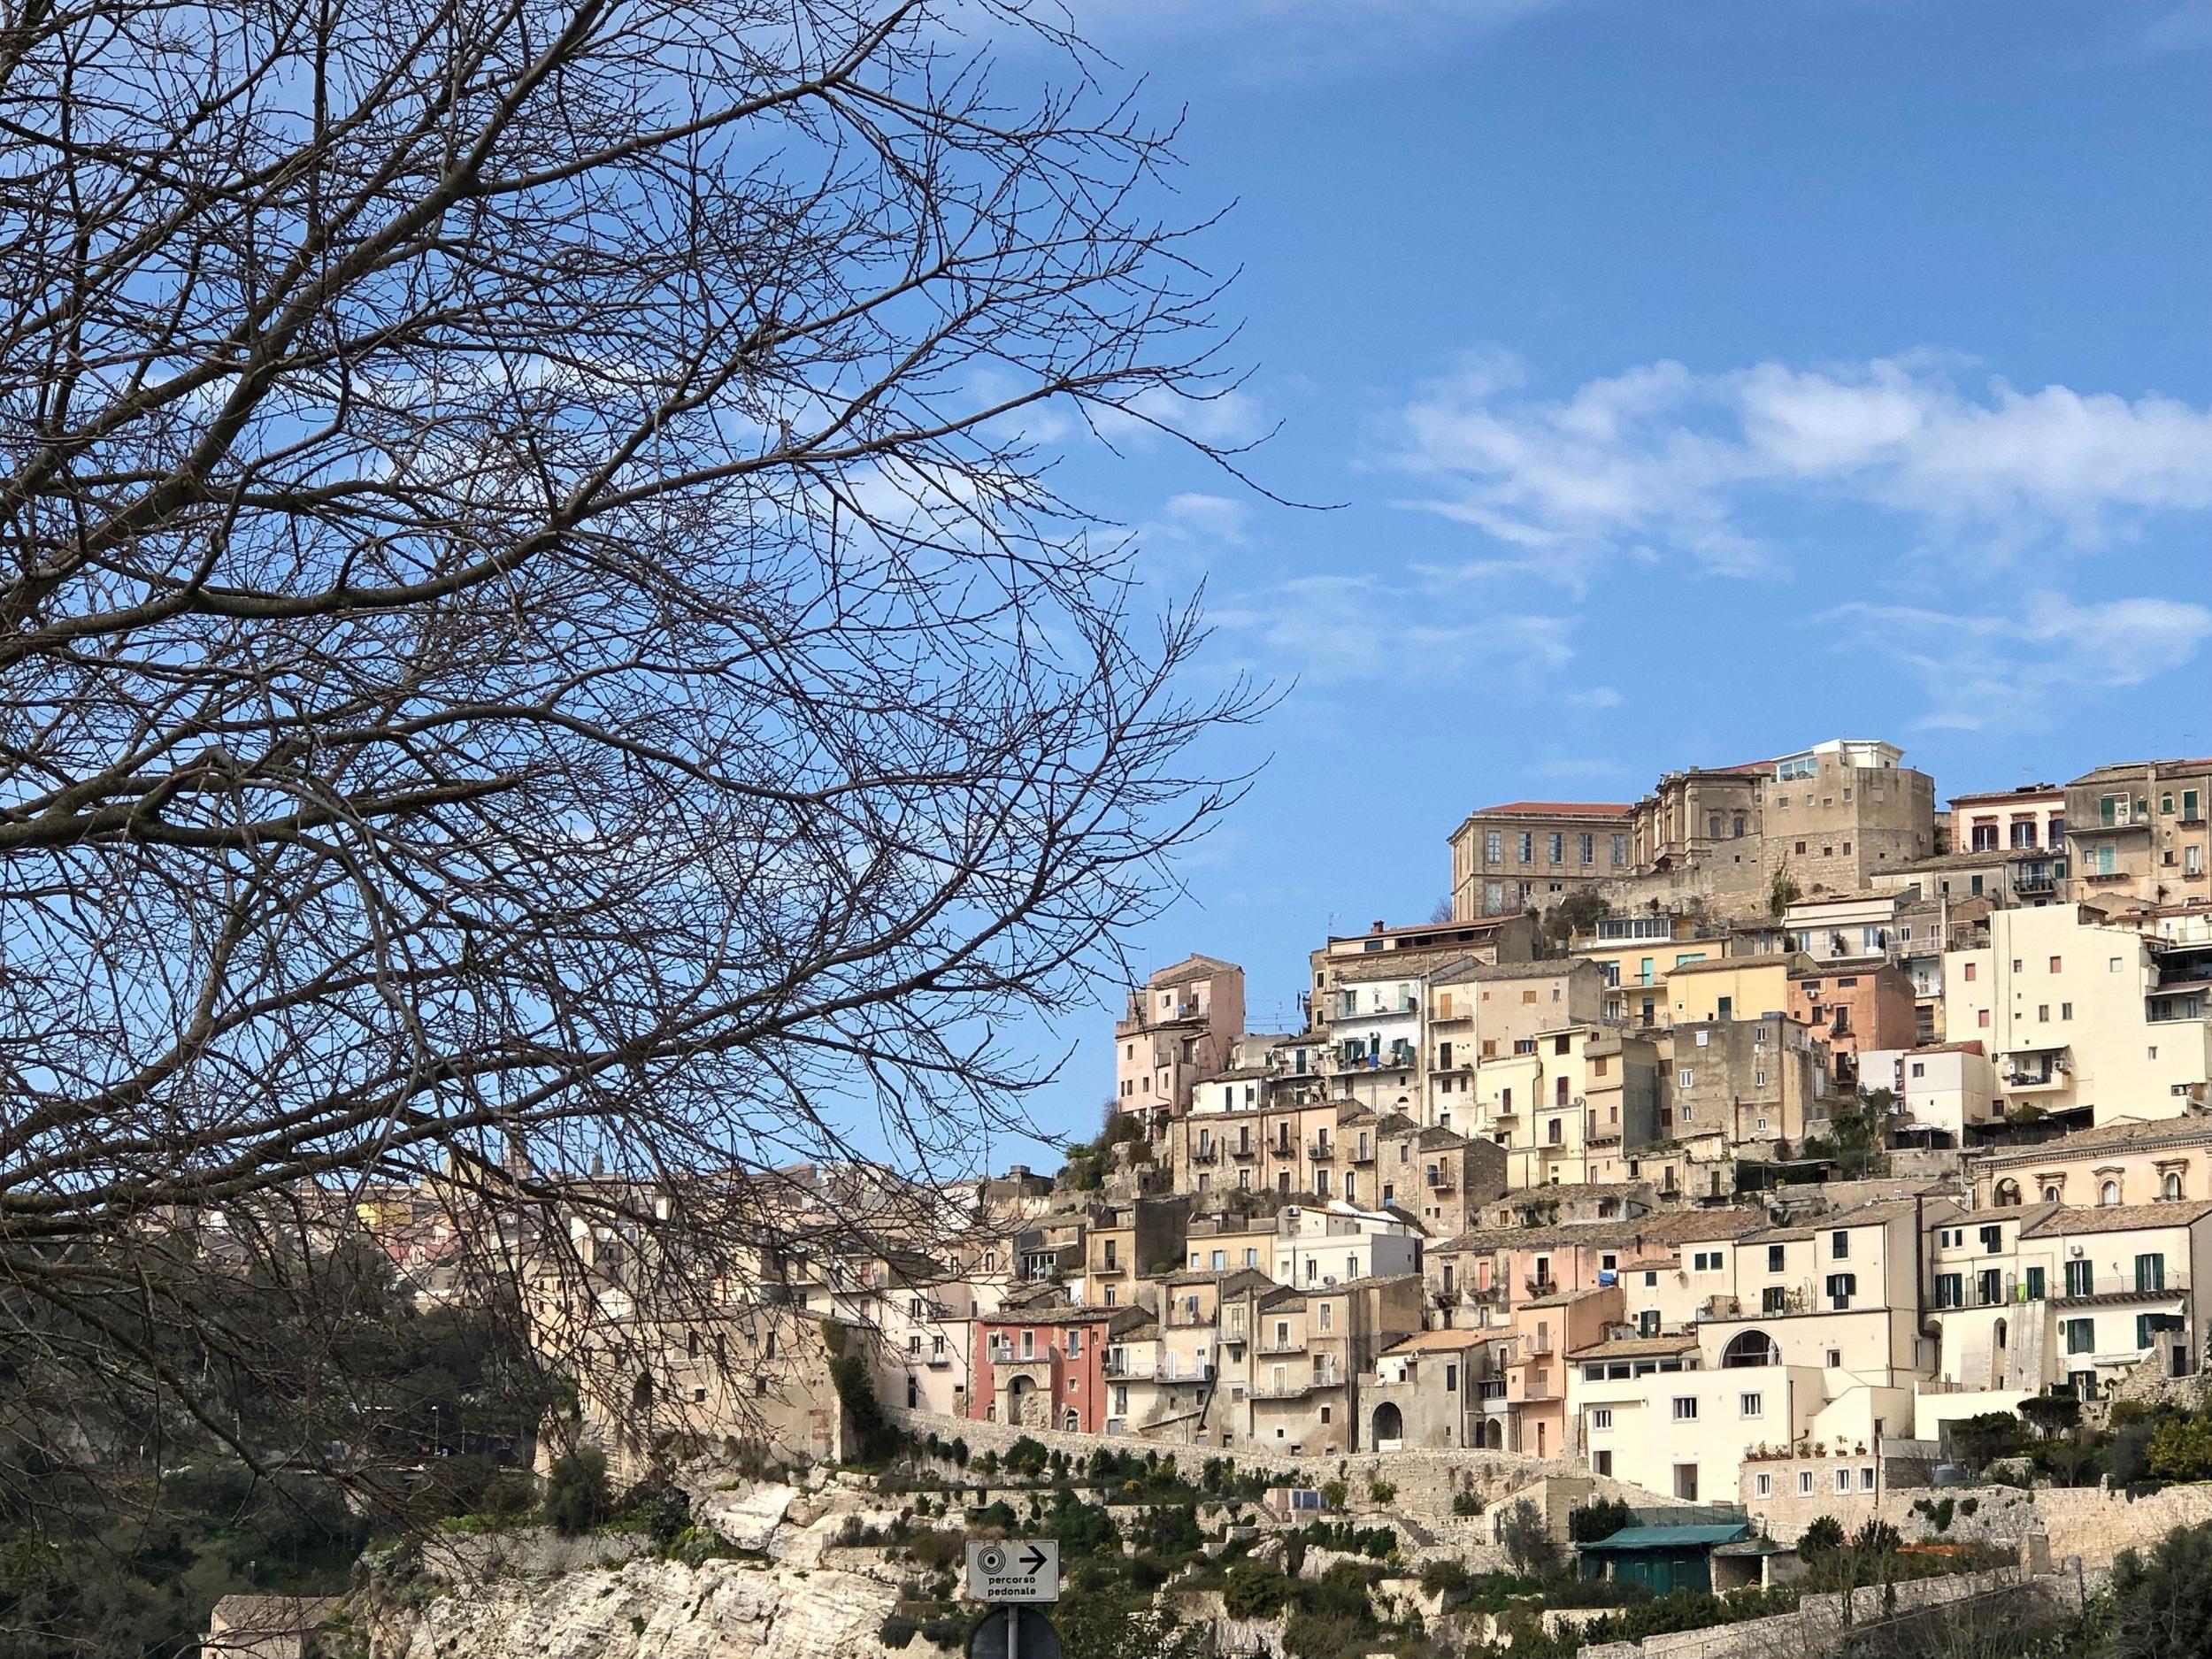 Auto-Elite-Sicily-Ragusa24.jpeg